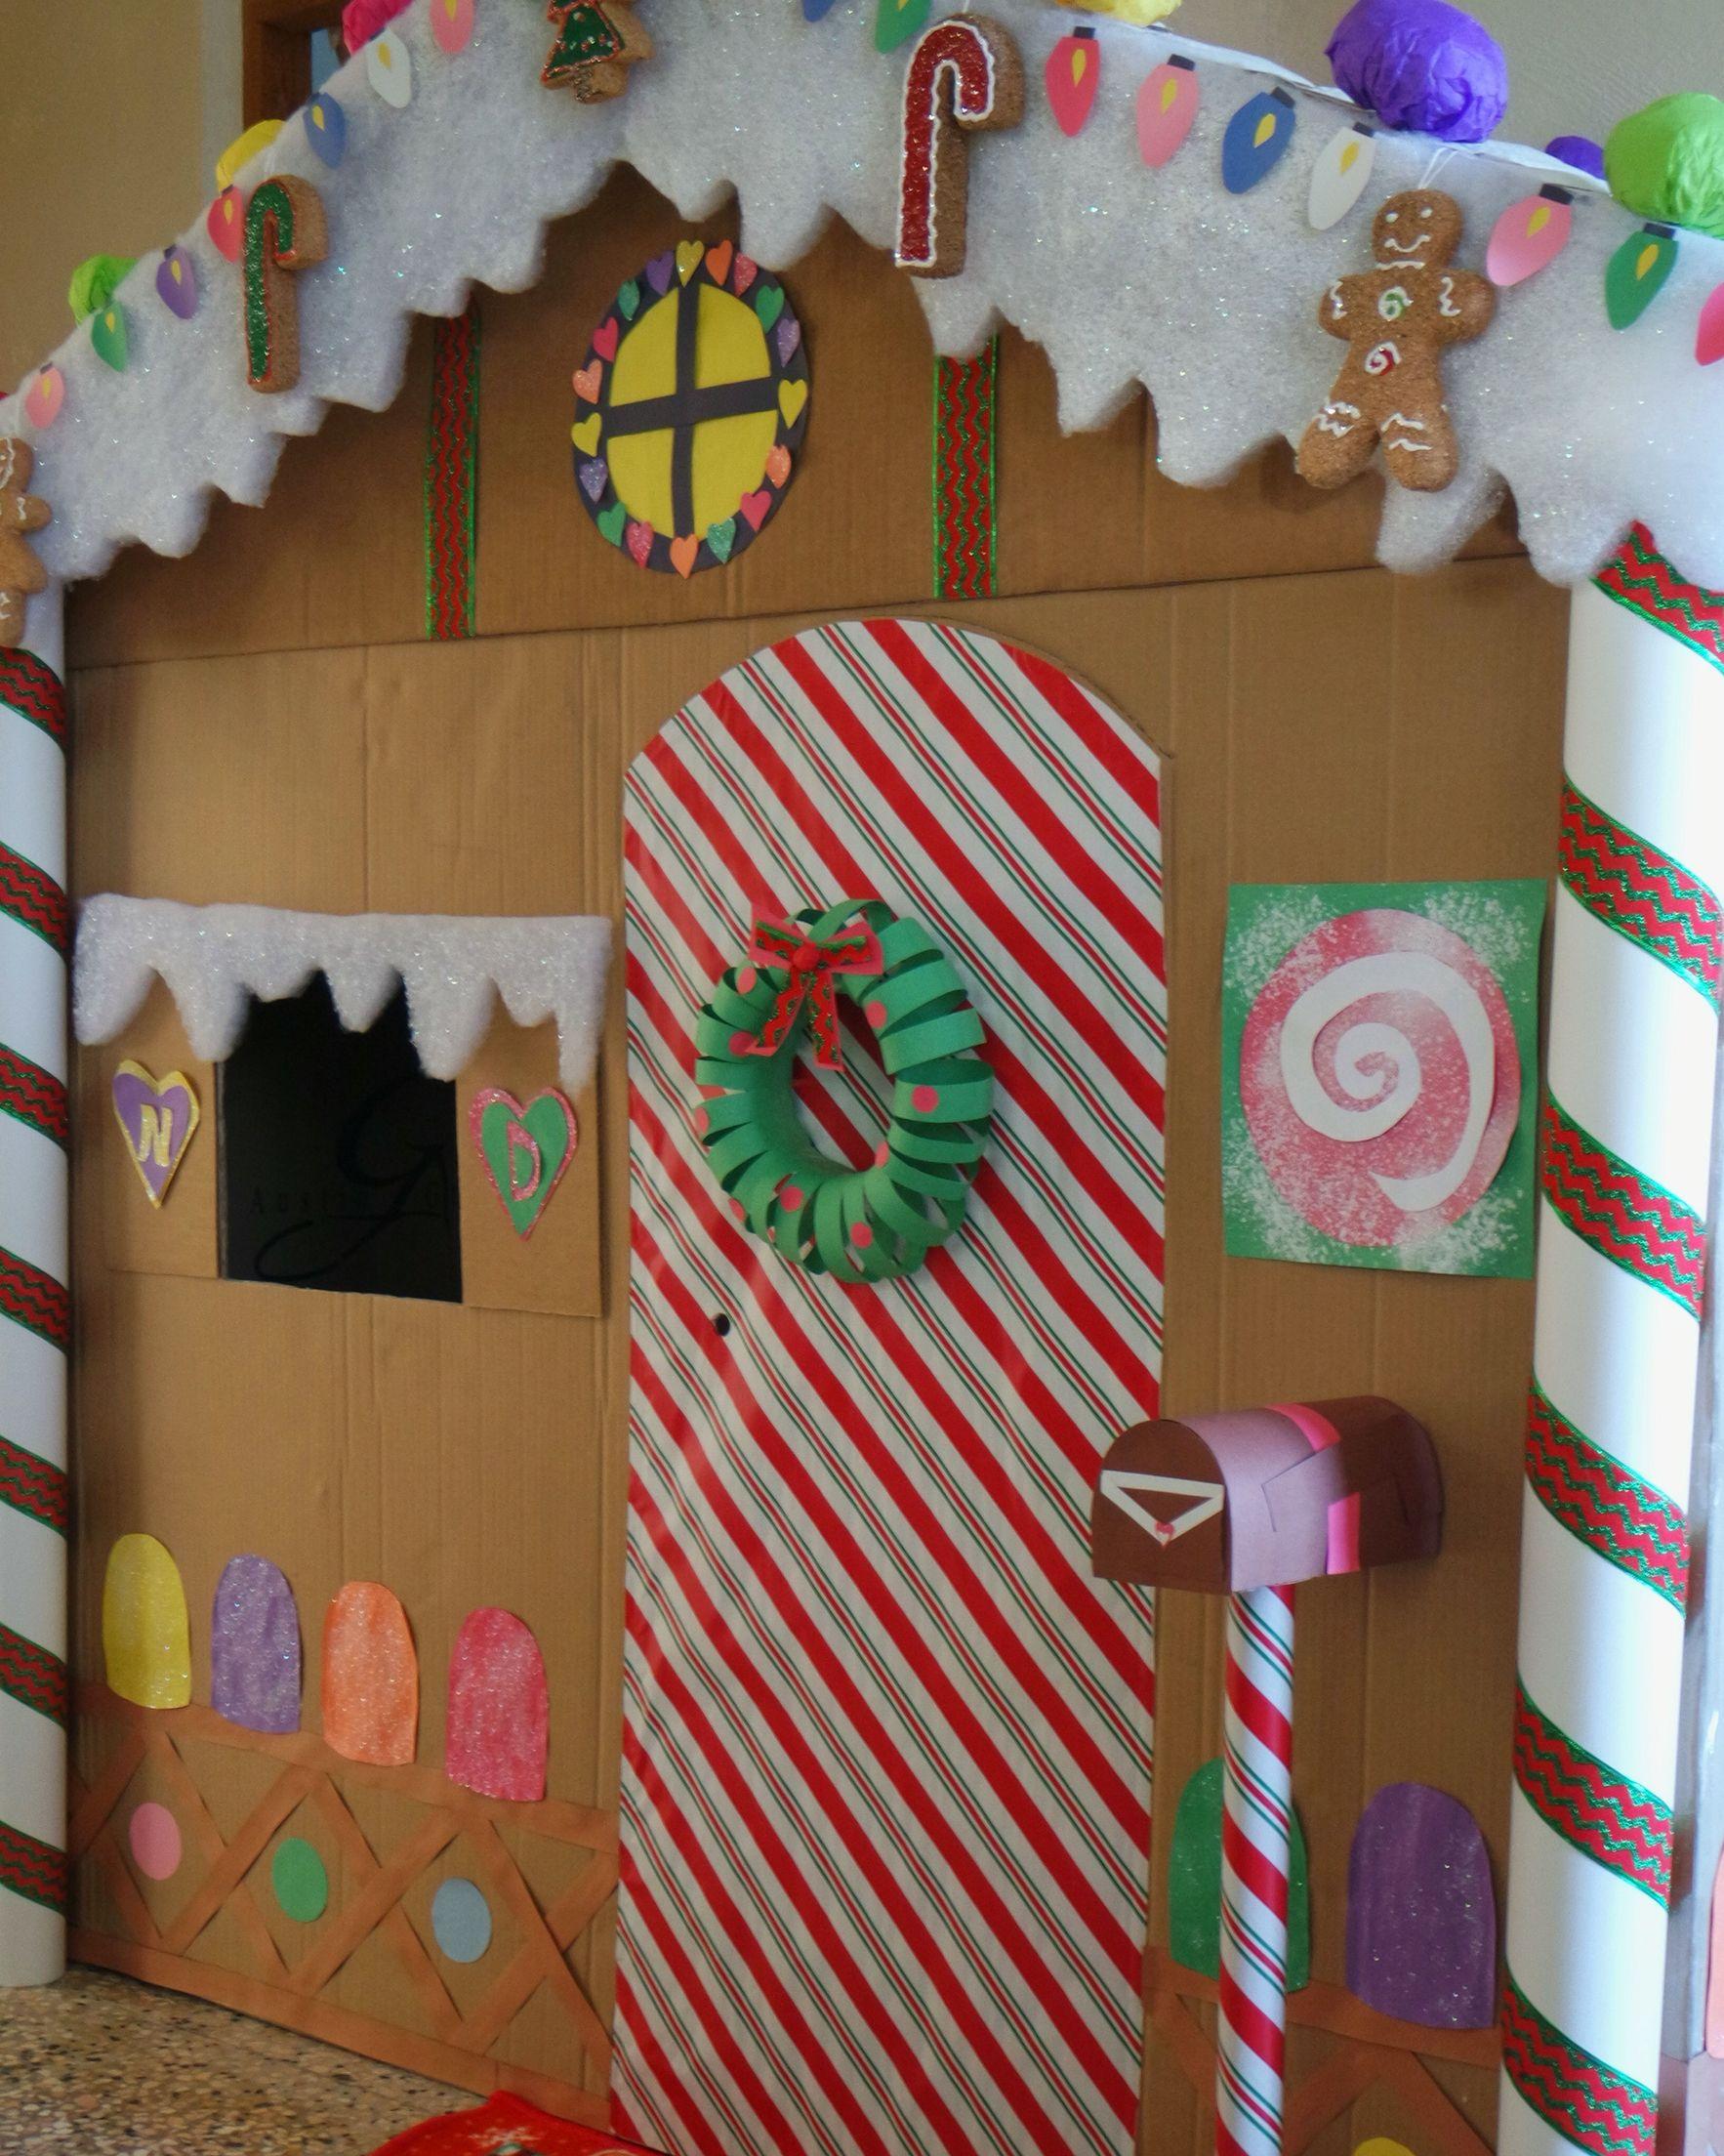 Giant Gingerbread House Using Cardboard